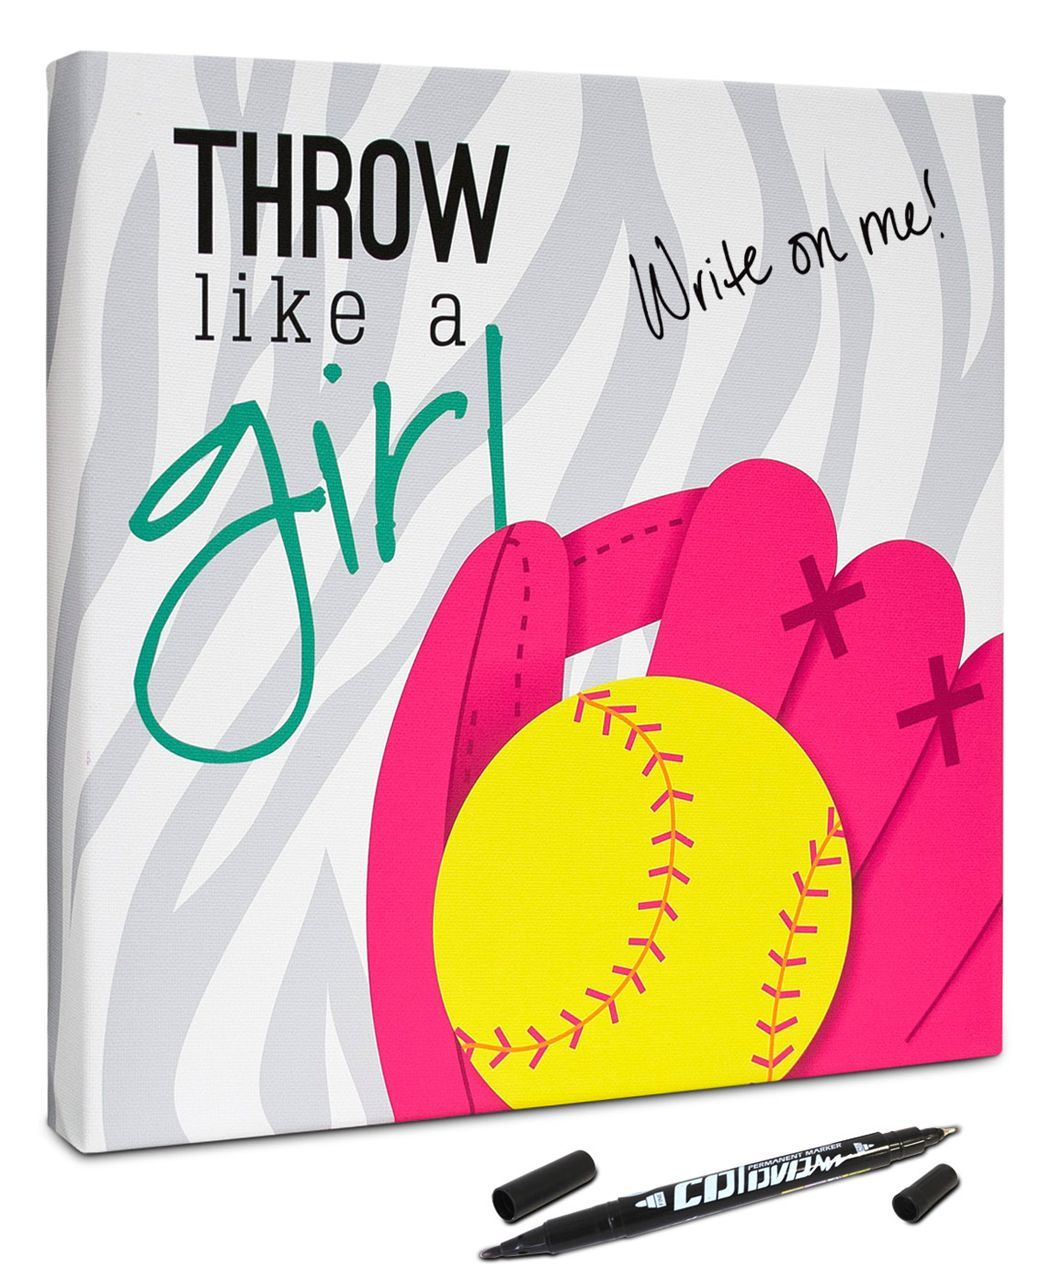 Artikel Softball : artikel, softball, Super, #softball, Girls!, Whole, Keepsake., Great, Coaches,, Softball, Gifts,, Birthday, Parties,, Crafts